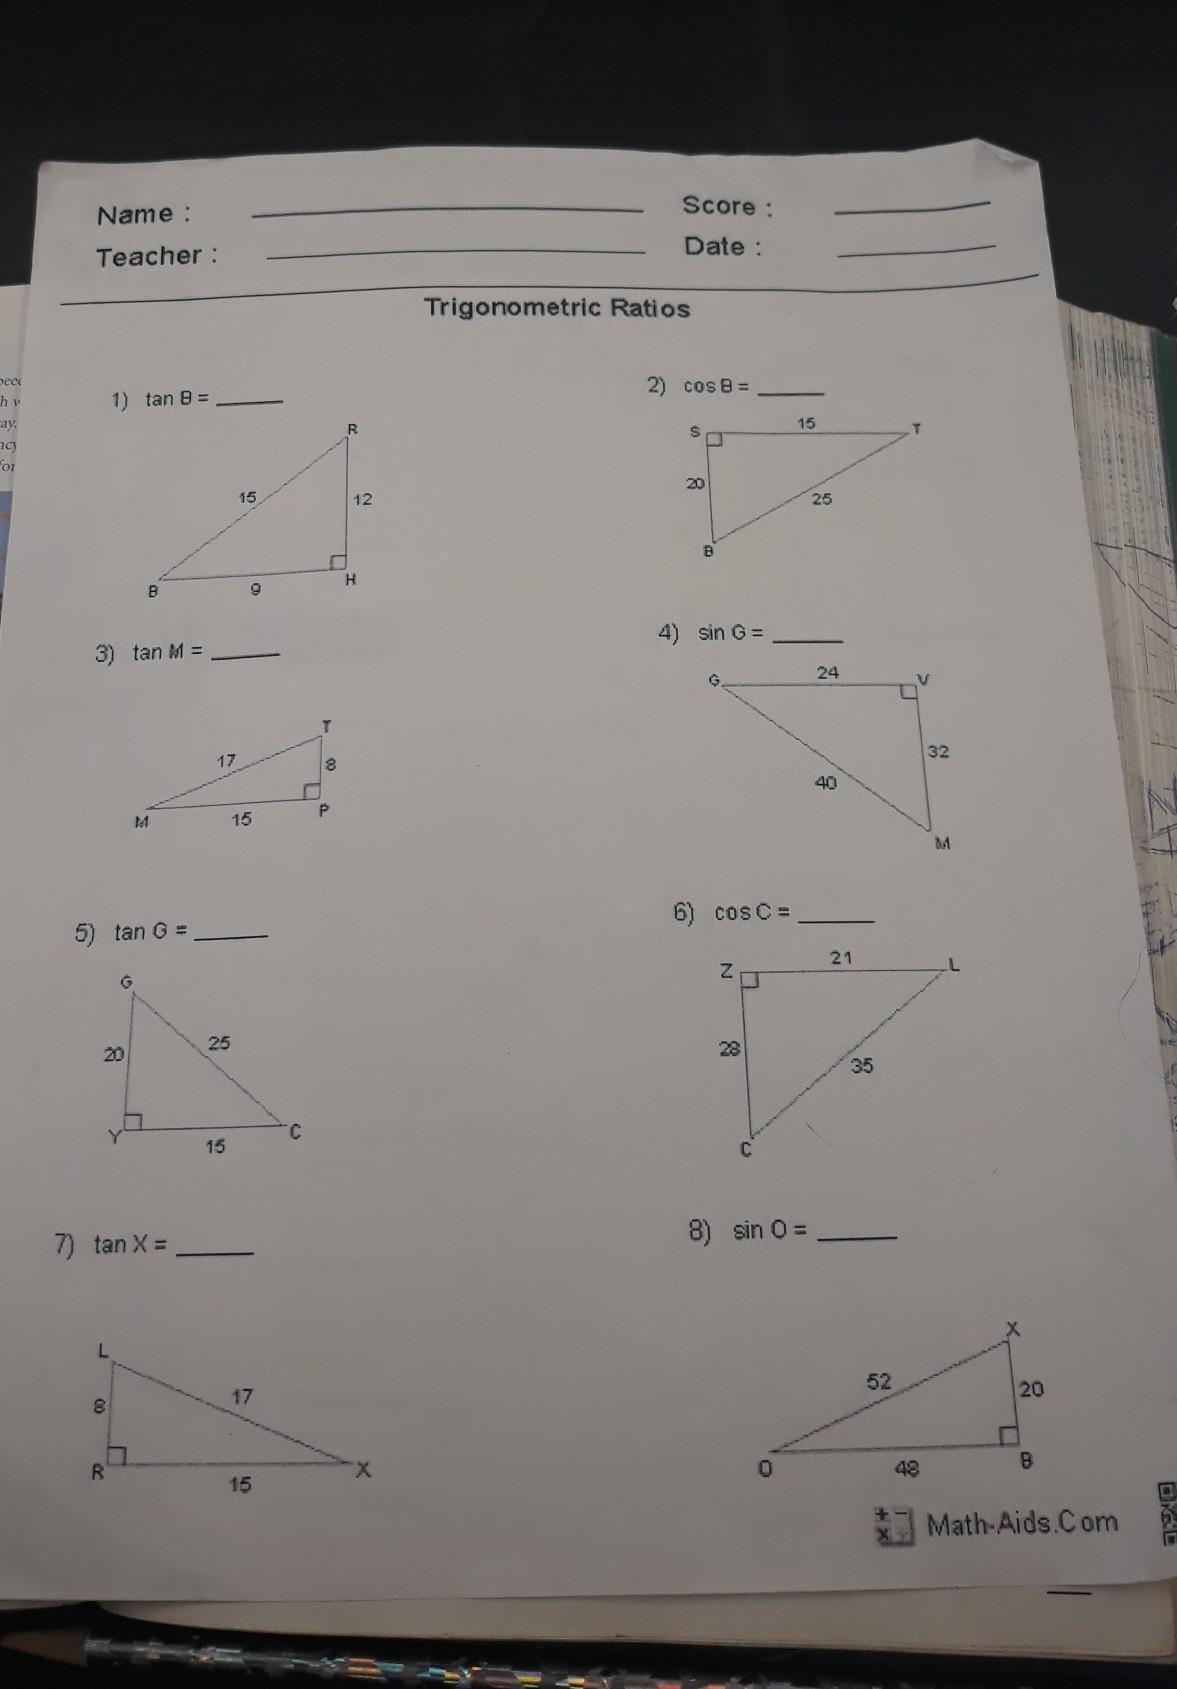 Trigonometric Ratios Worksheet From Math Aids